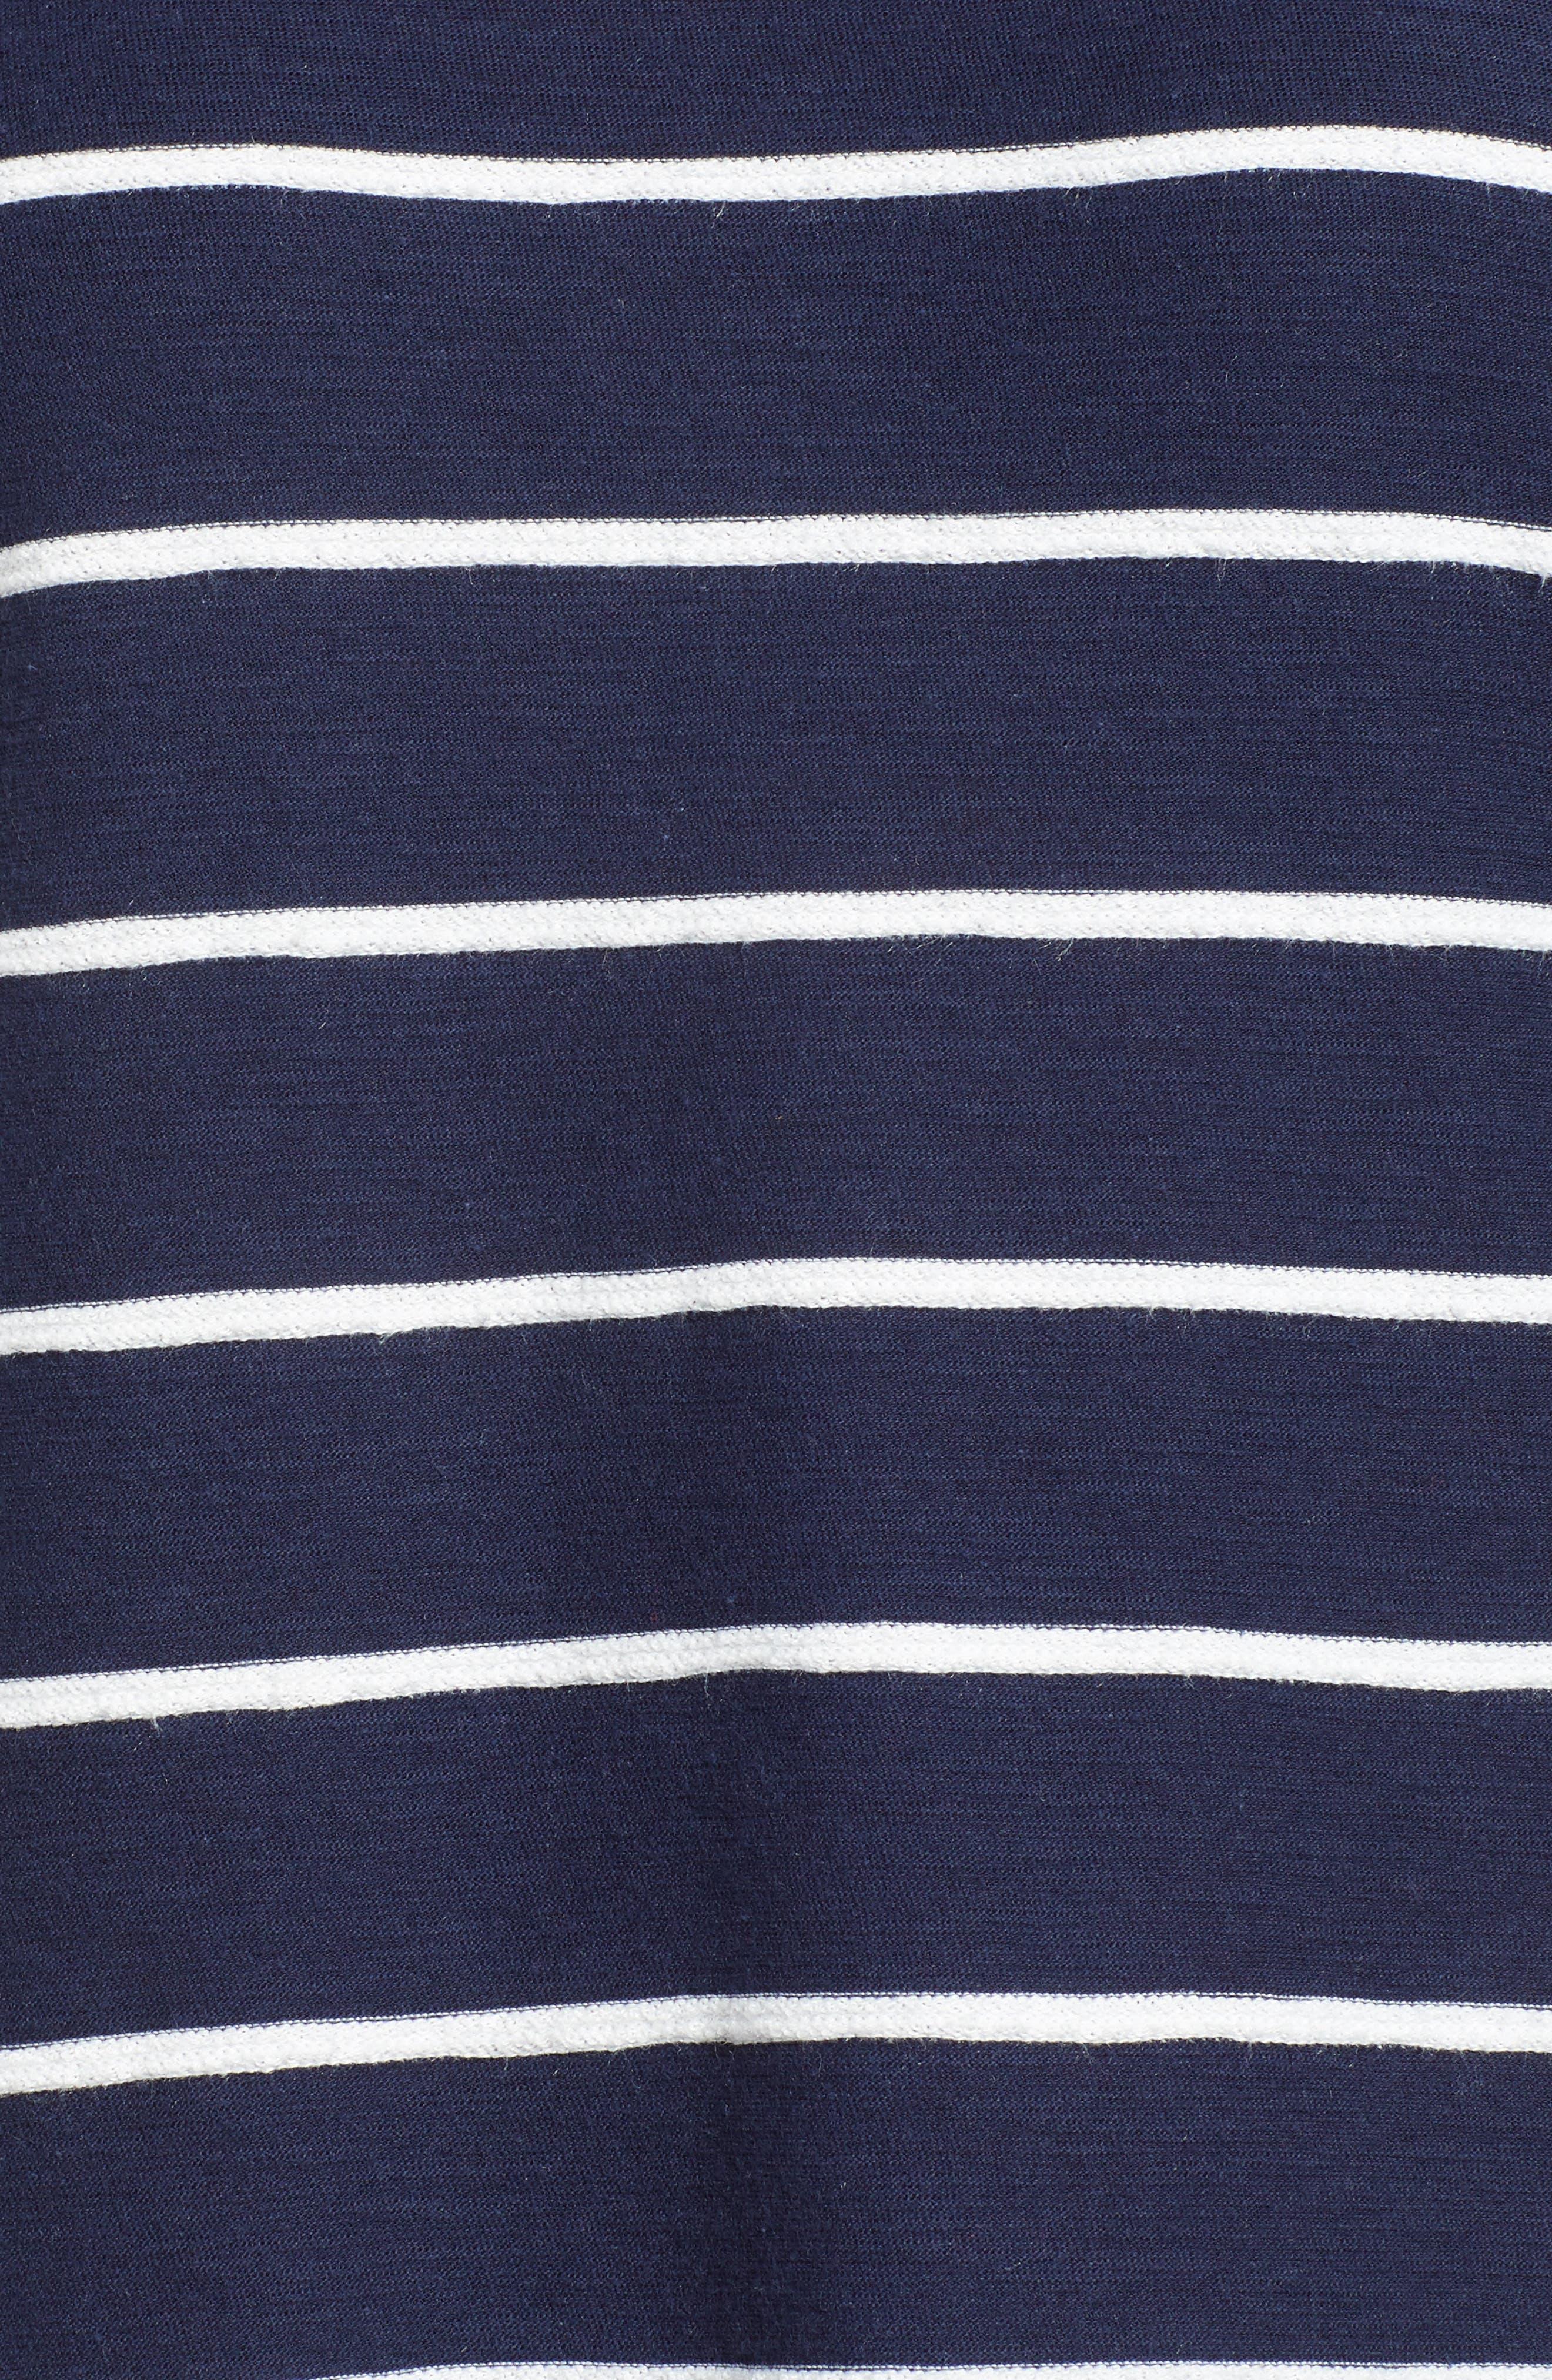 Side Tie Stripe Tee,                             Alternate thumbnail 16, color,